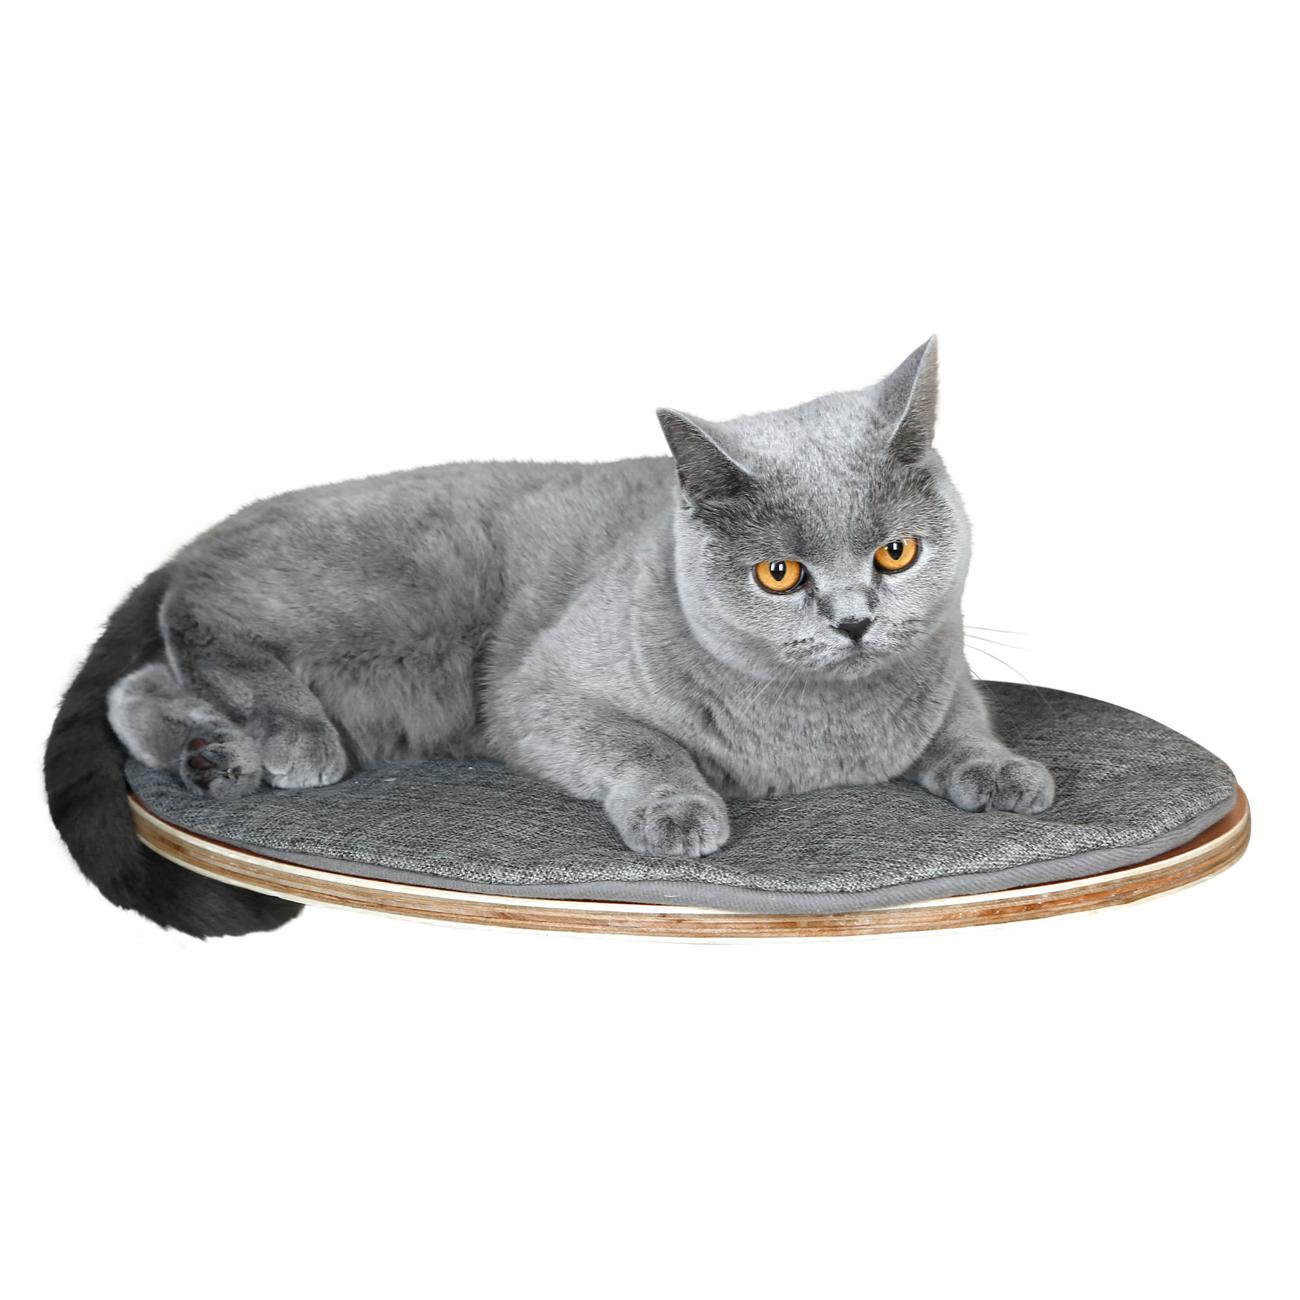 Kerbl Katzen Wandliegebrett Tofana oval, Bild 2